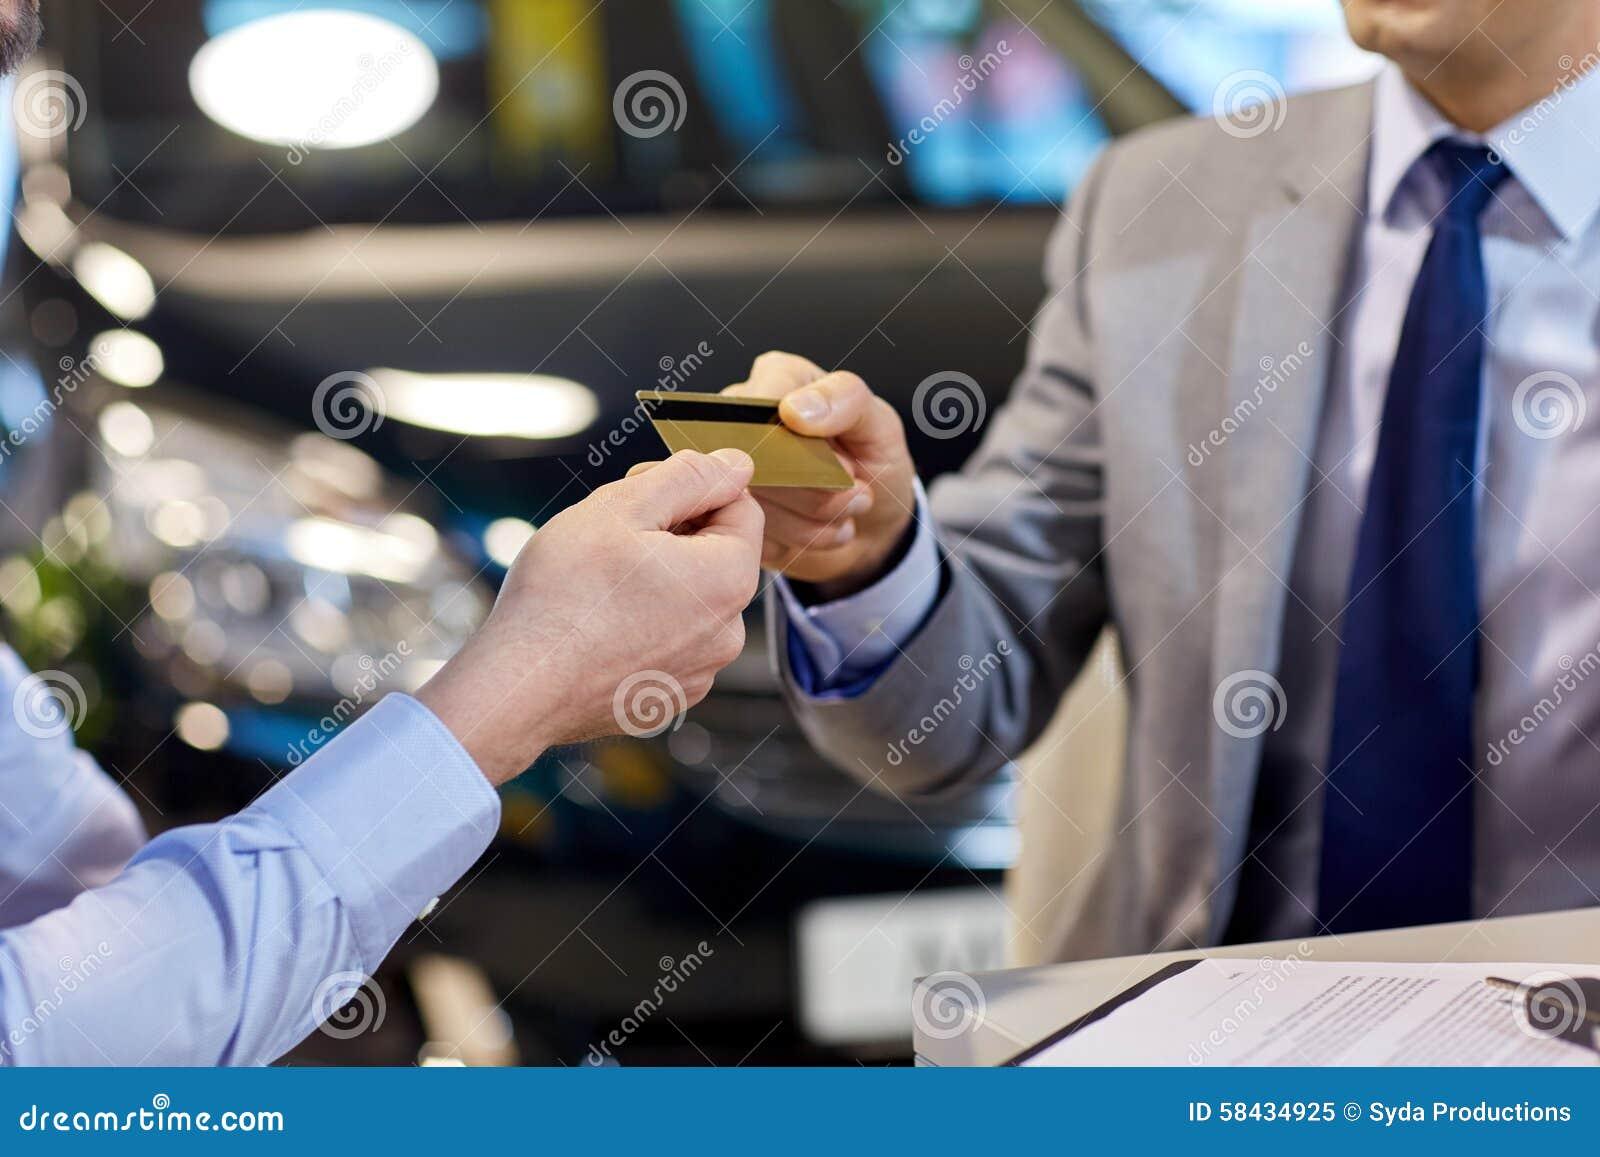 customer giving credit card to car dealer in salon stock image image of customer automobile. Black Bedroom Furniture Sets. Home Design Ideas